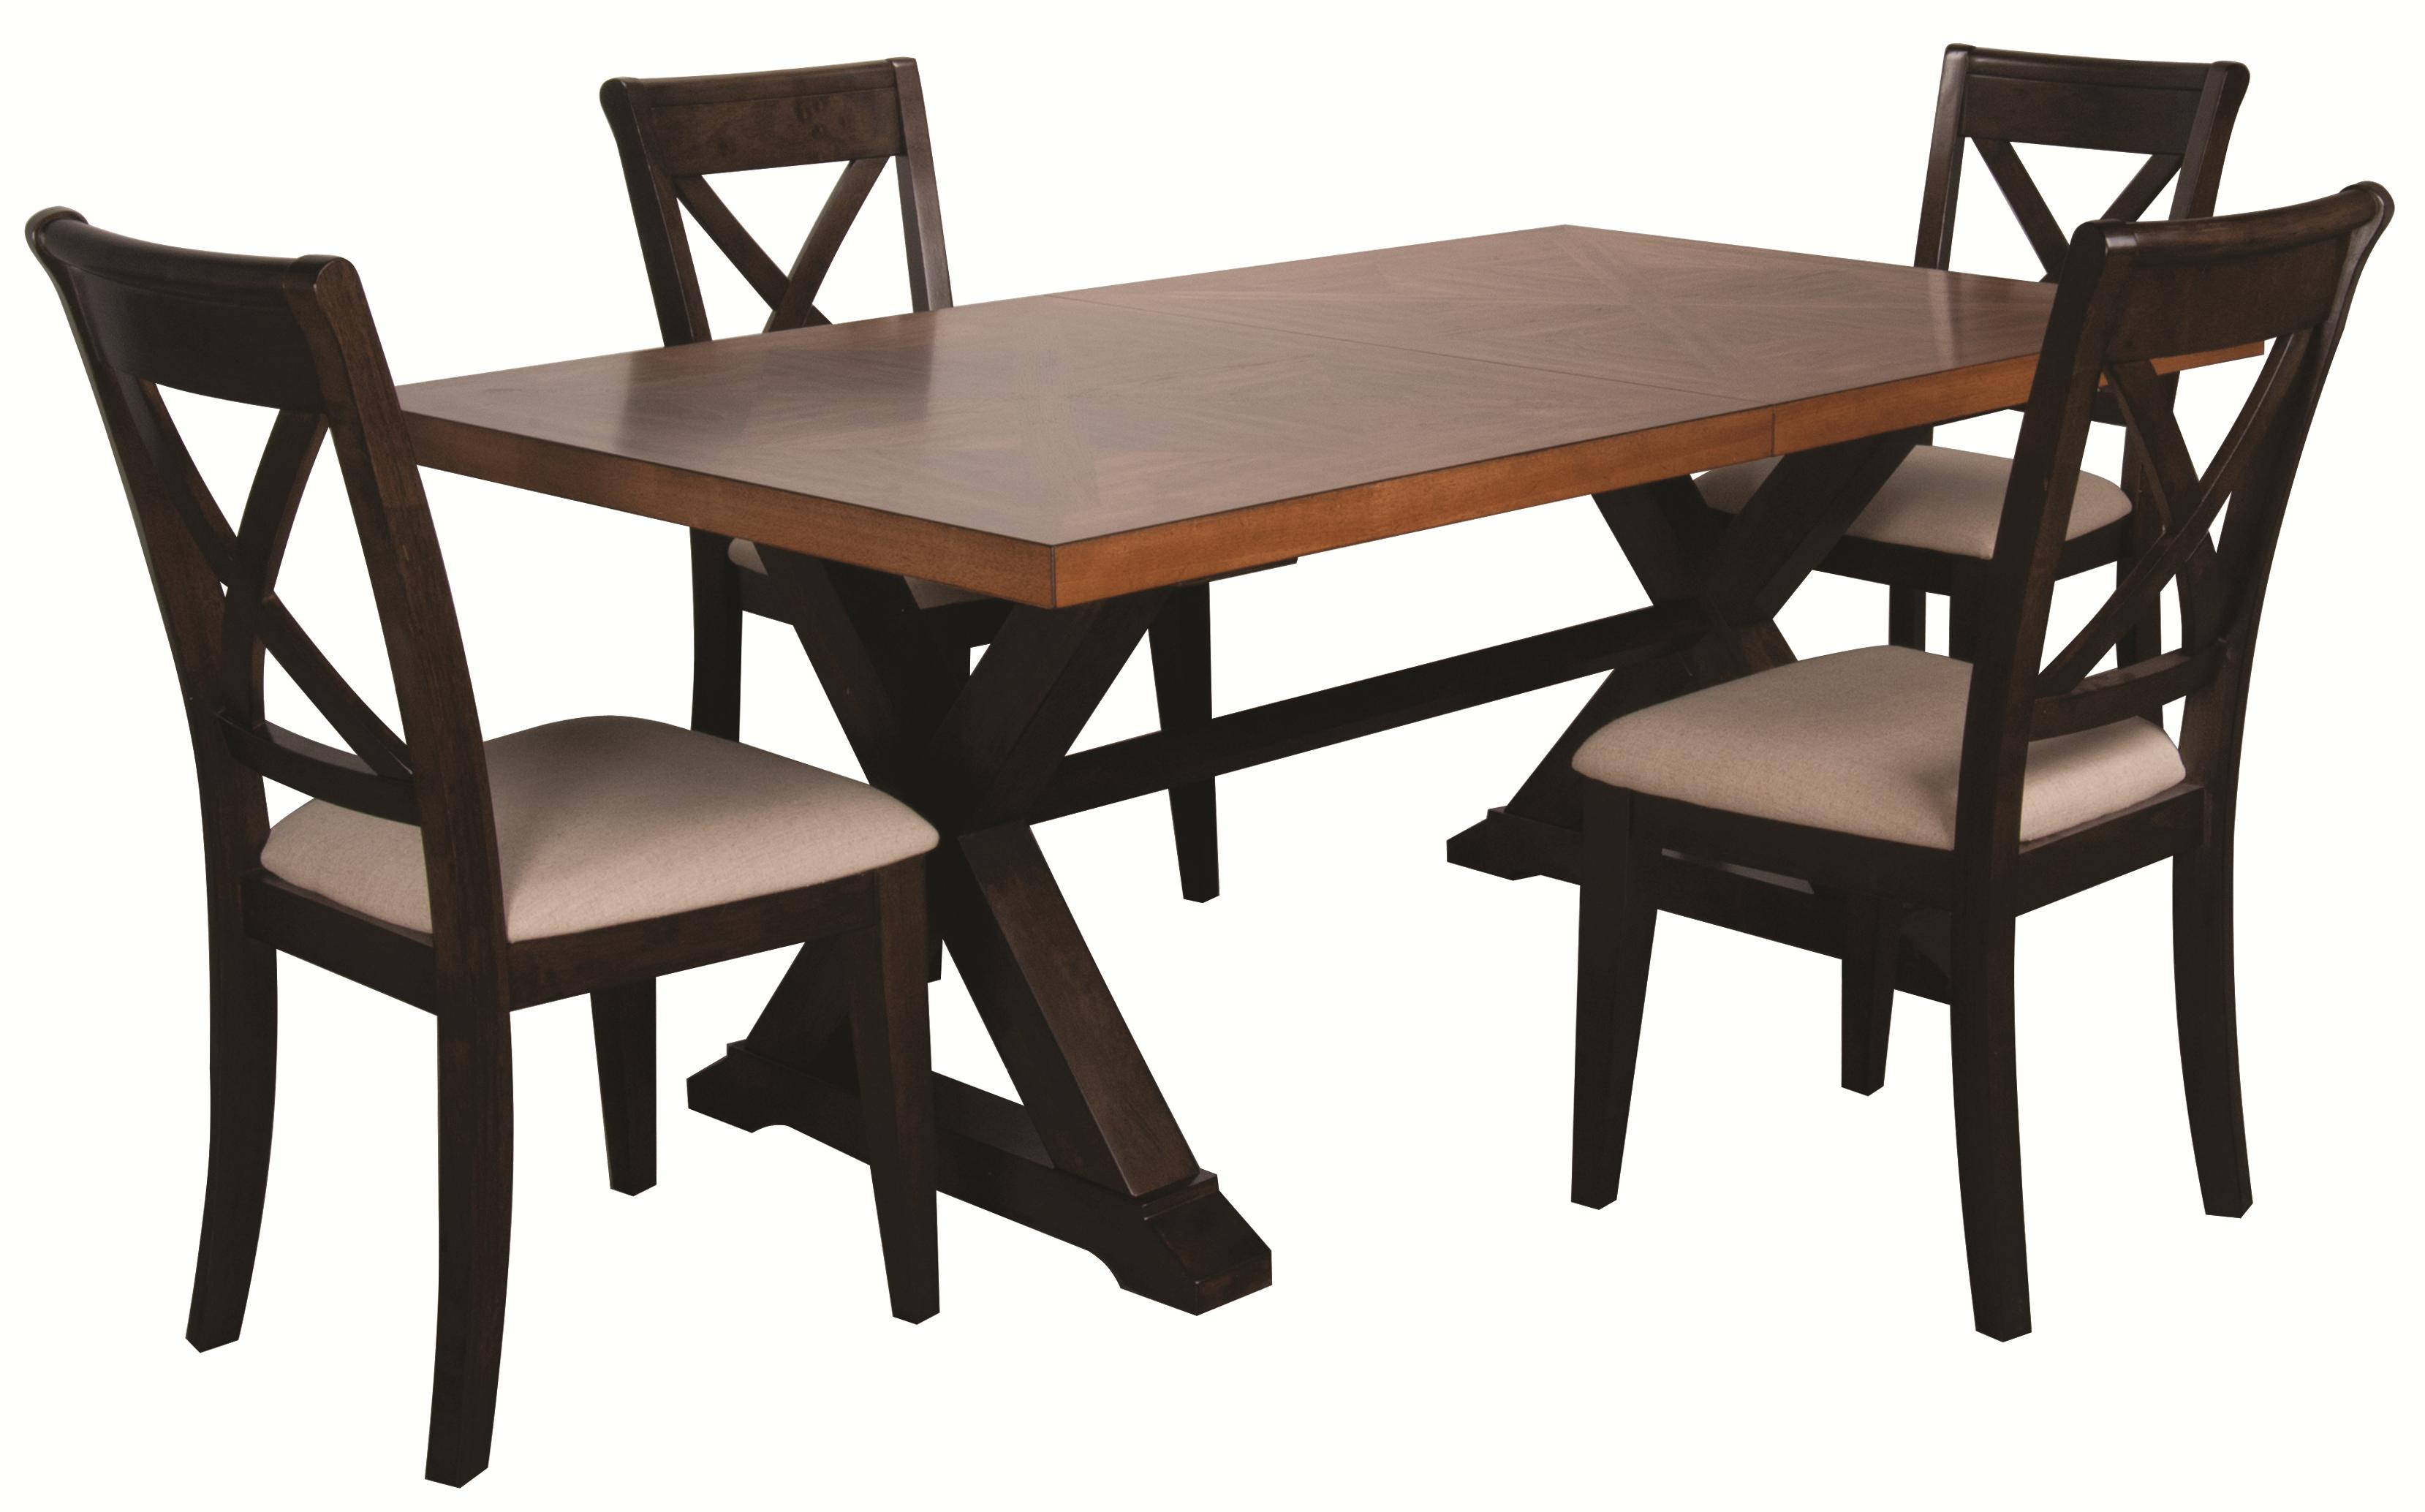 Morris Home Furnishings Saranac Saranac 5 Piece Dining Set - Item Number: 1283-4296/313-S